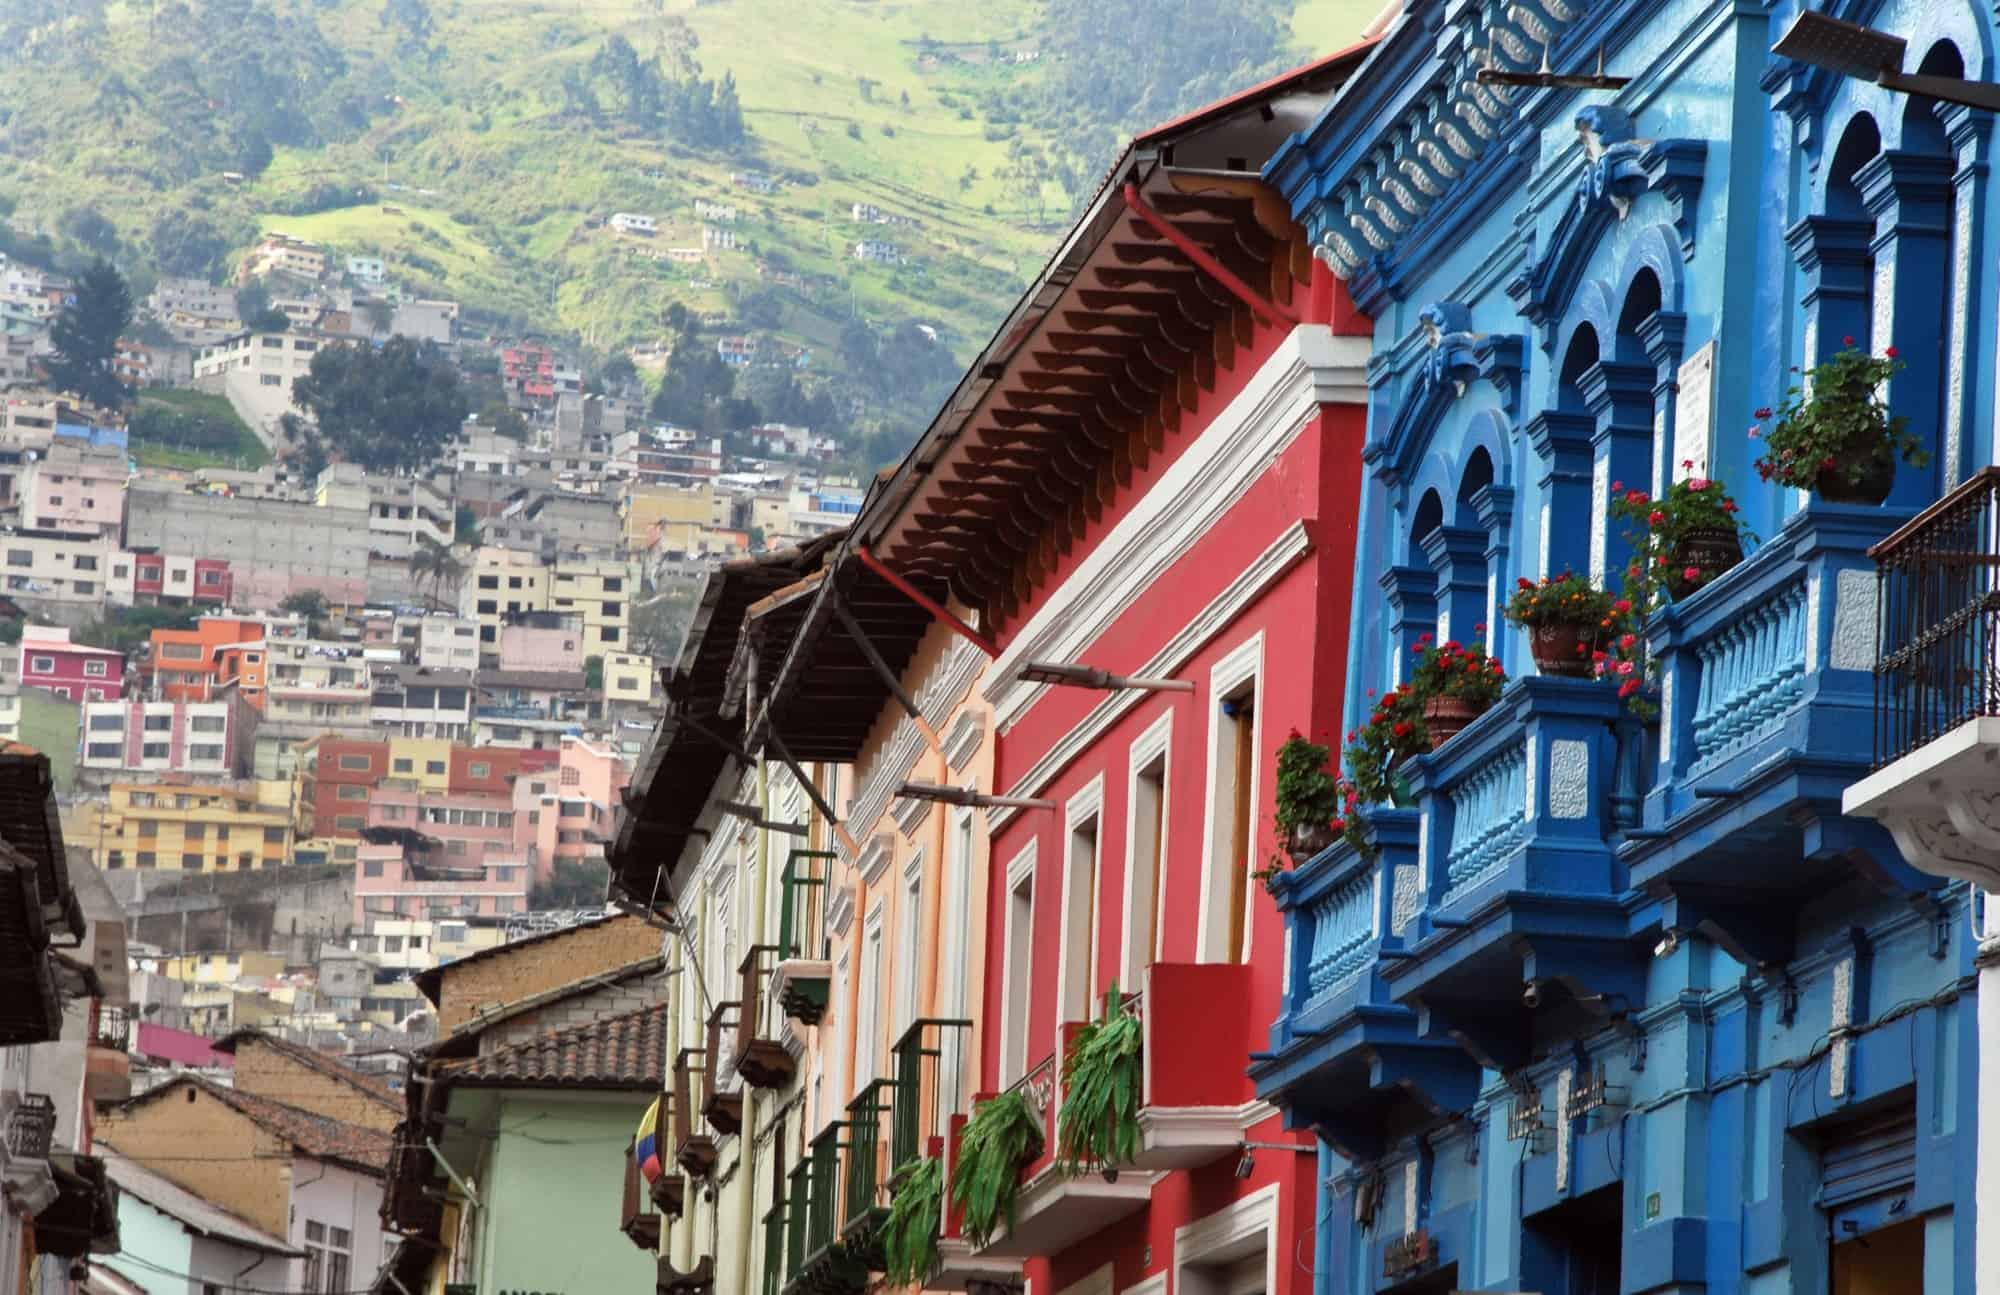 quito-ecuador-travel-by-bigstock-alessandro-pinto